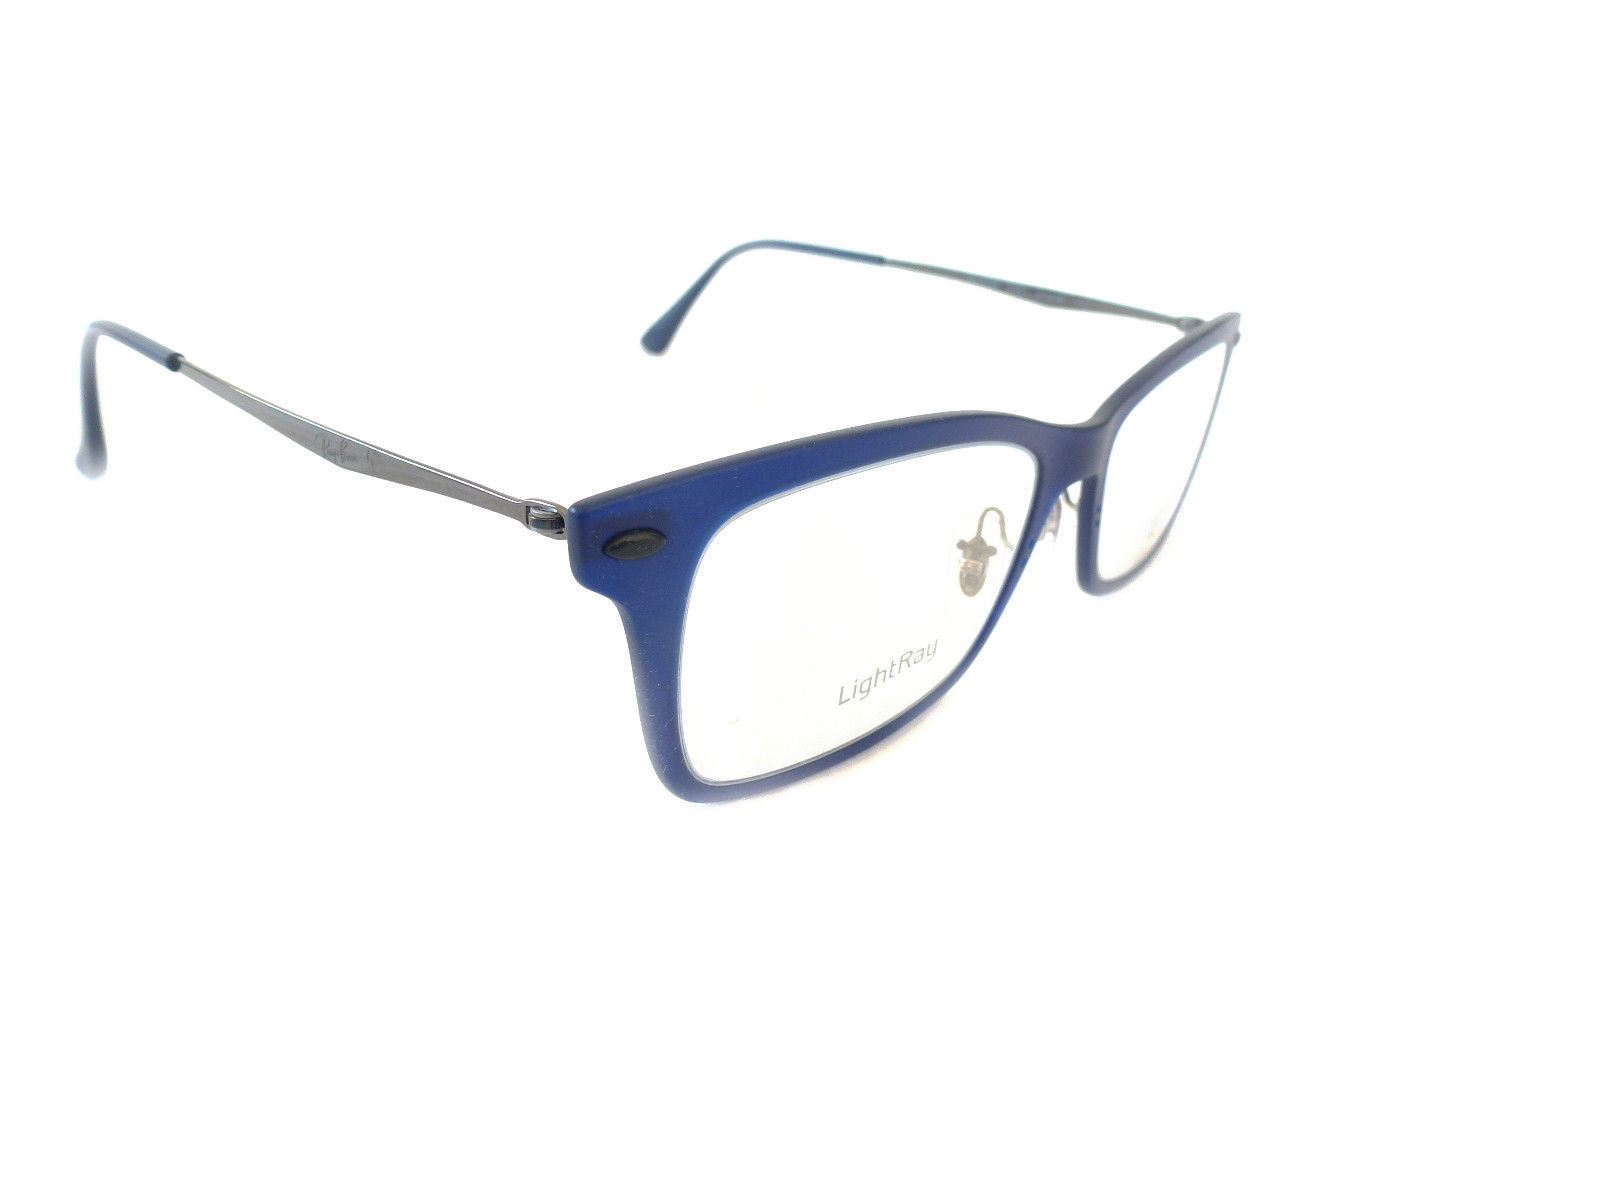 Ray Ban Fake Sunglasses Titanium Frames | Louisiana Bucket Brigade